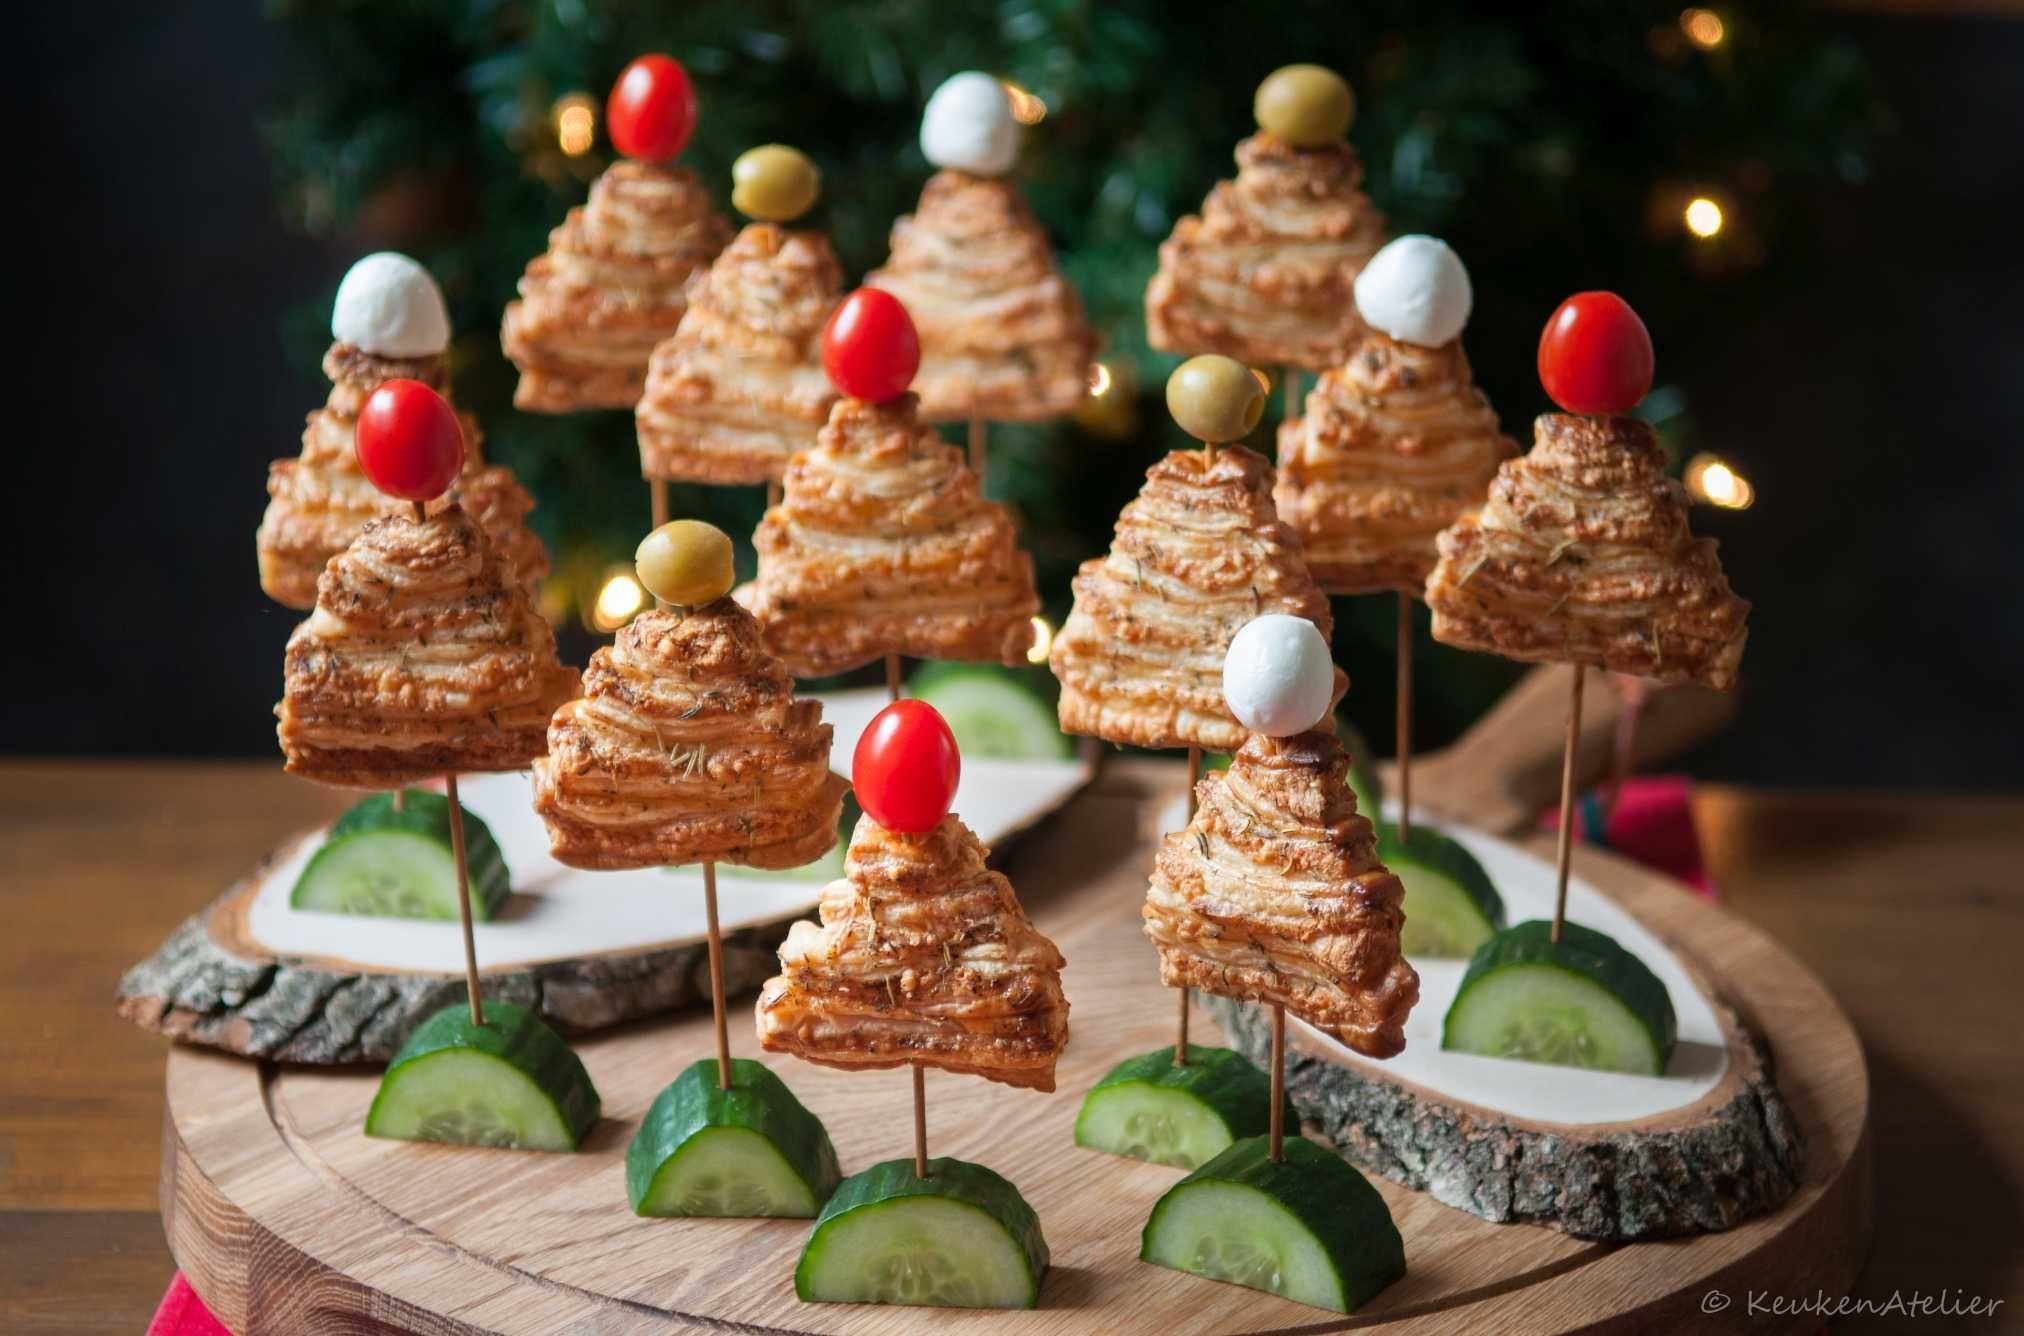 Kerstboom kaaskoekjes - Keukenatelier